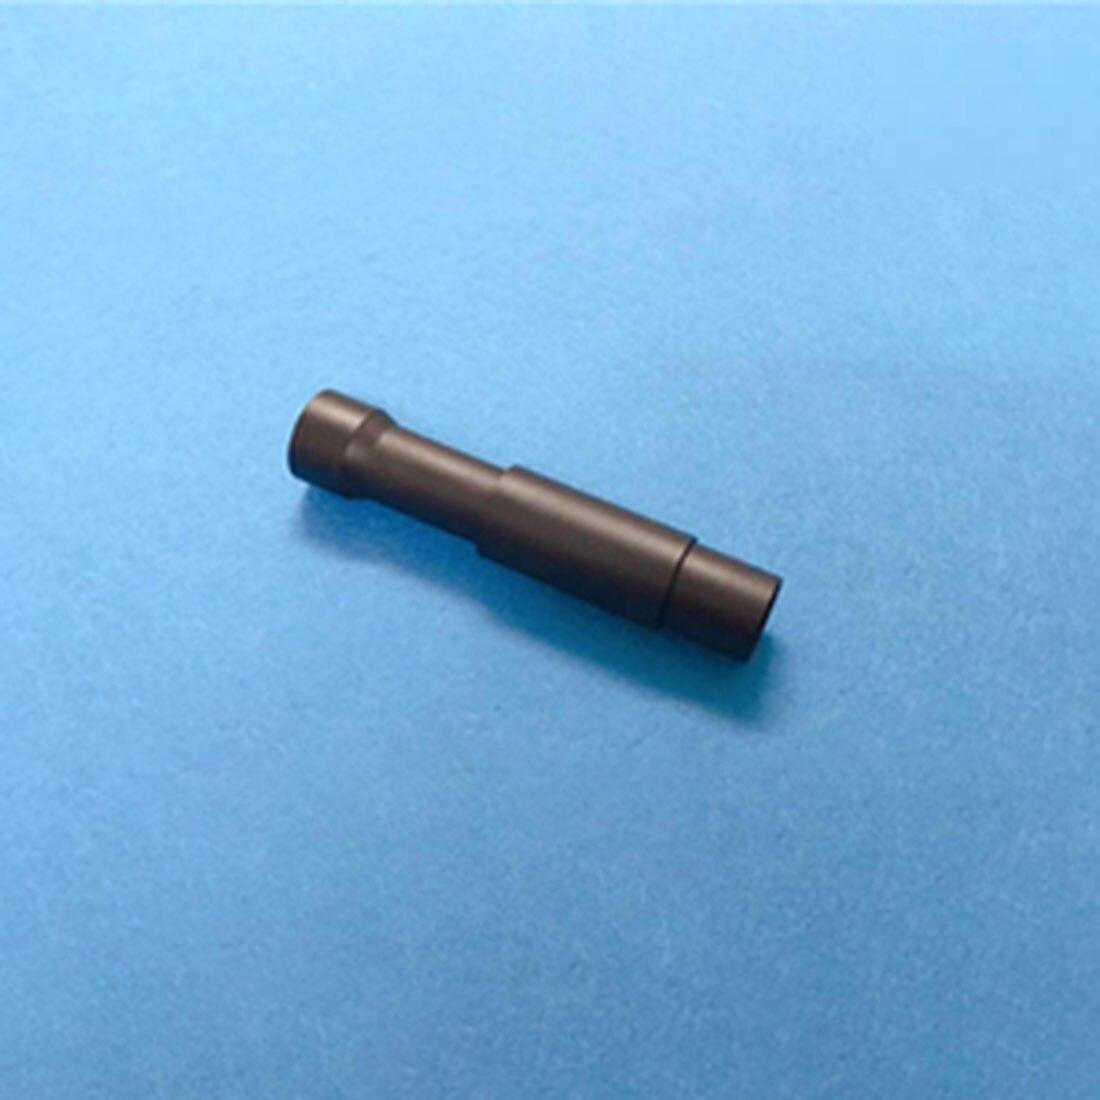 Tubo de extensión de tubo de carcasa metálica para LDT HK416D gen2.5 negro